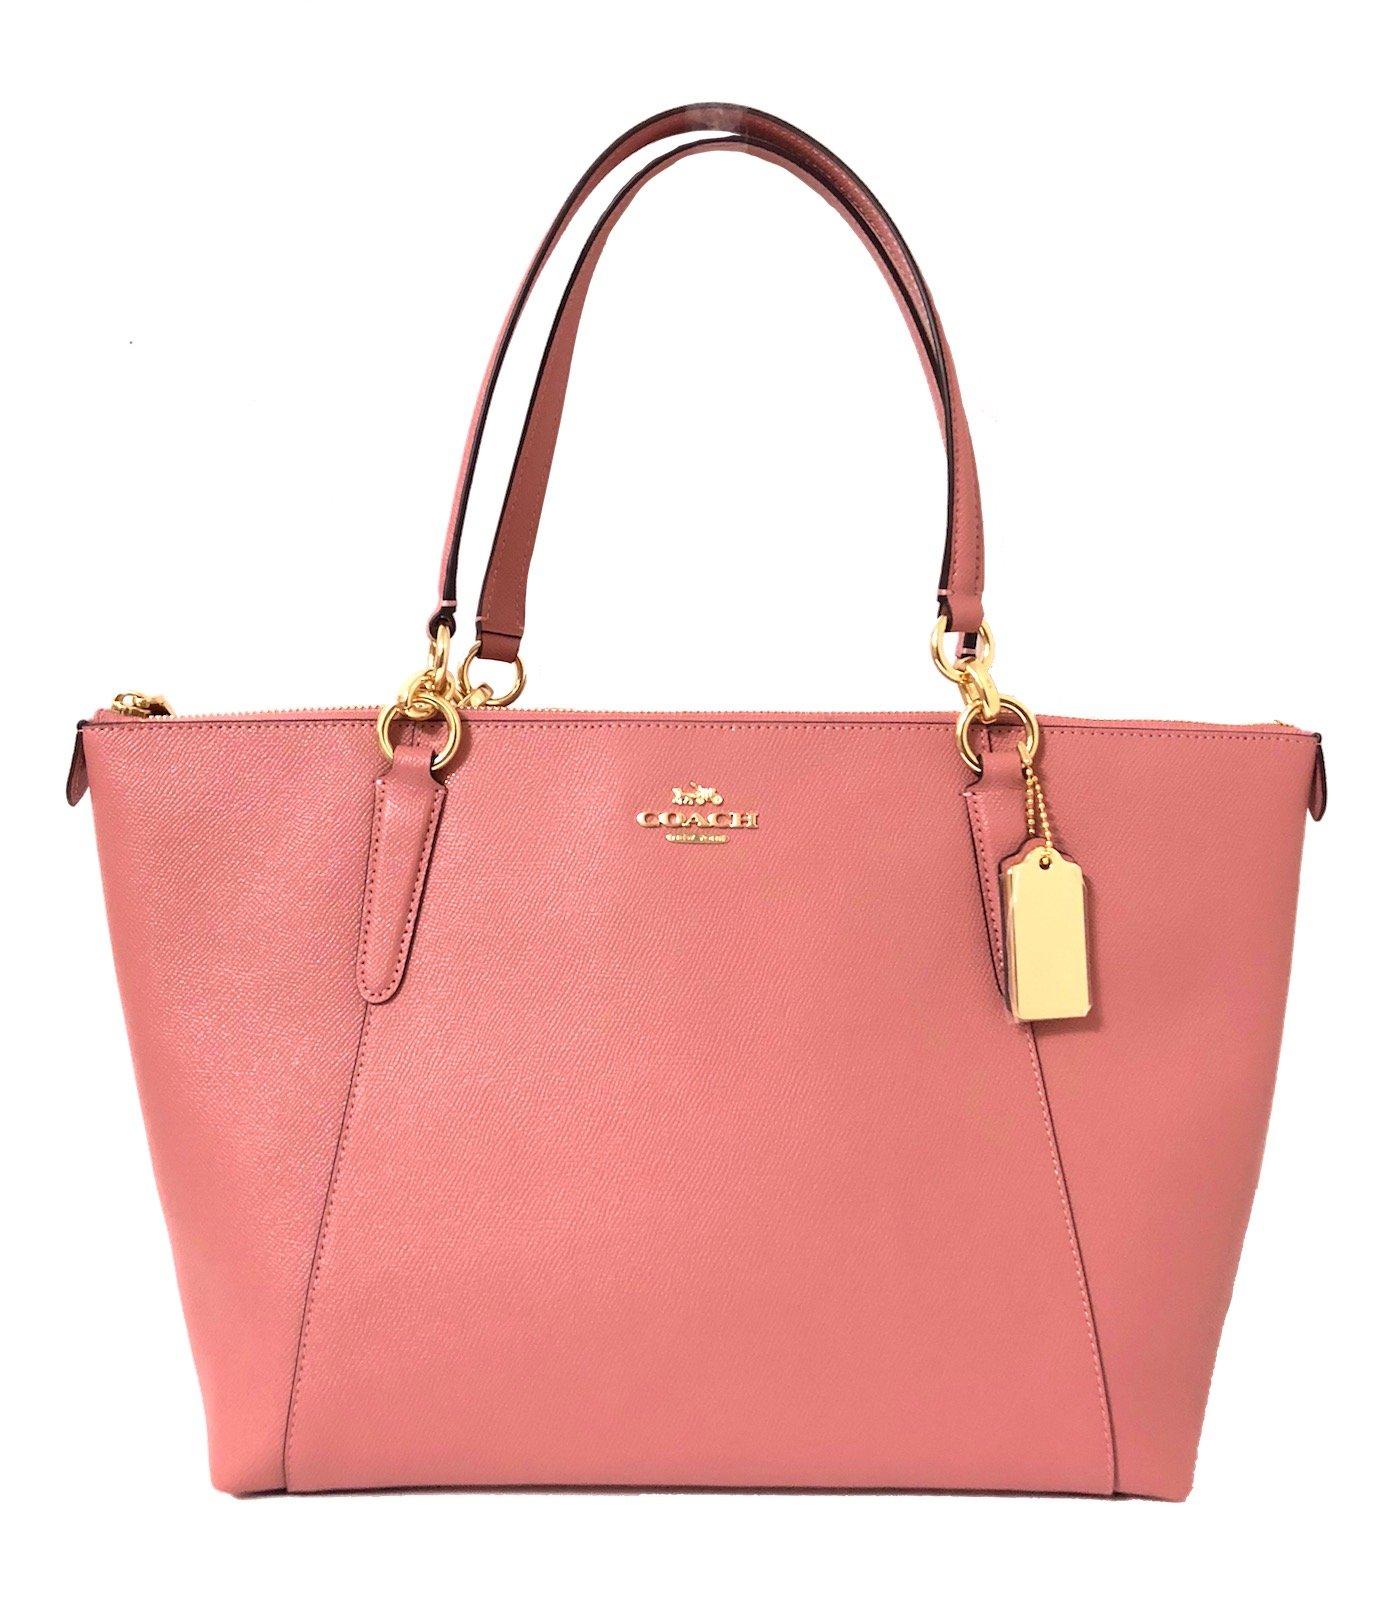 aa98de5455 Galleon - Coach AVA Leather Shopper Tote Bag Handbag (IM Vintage Pink)